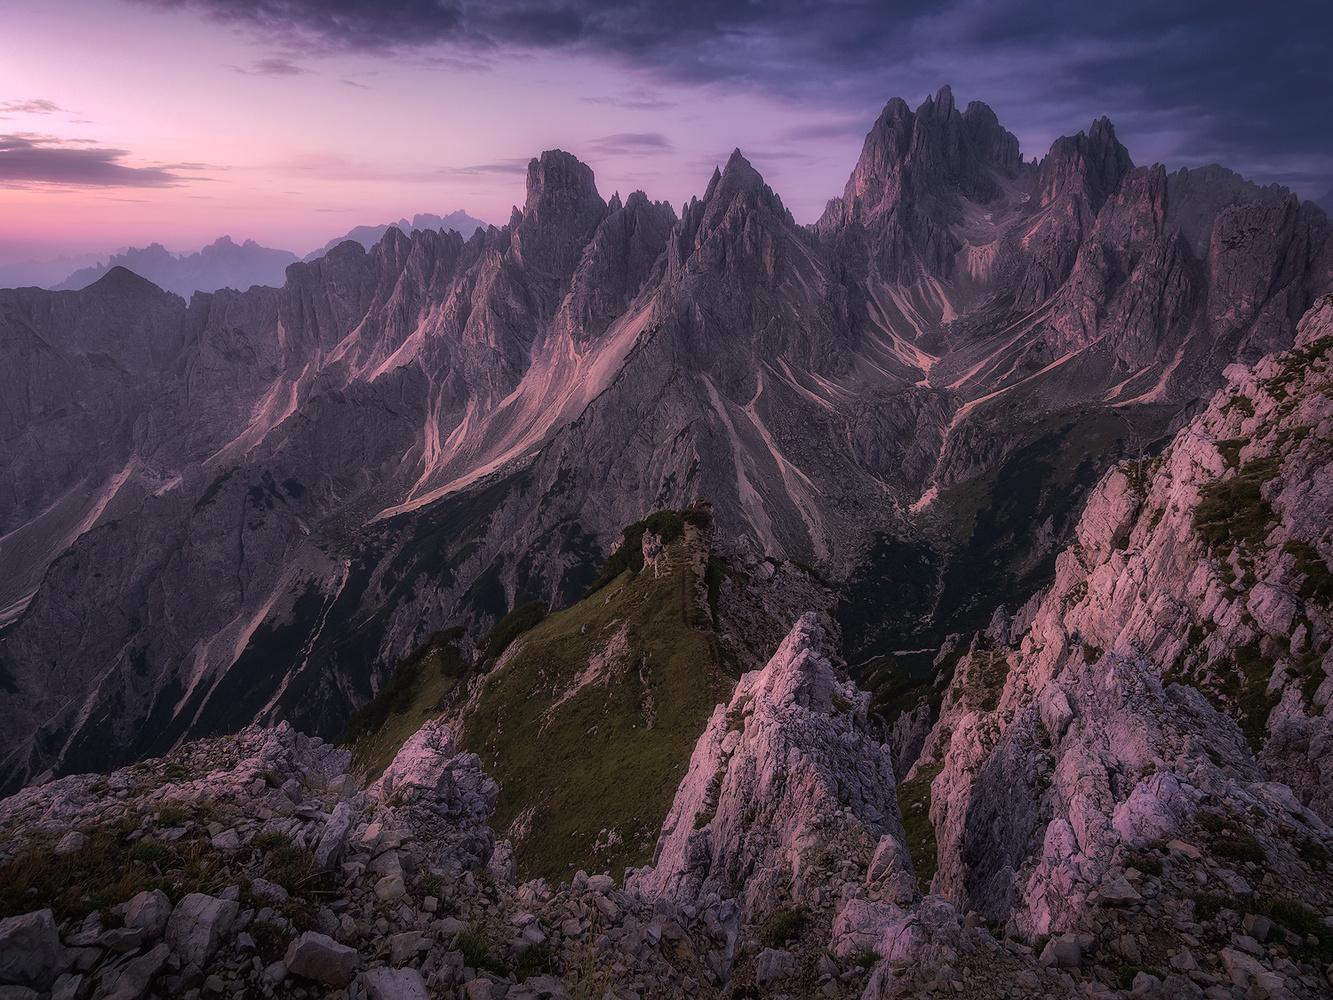 Cadini sunrise by Michele Buttazzoni